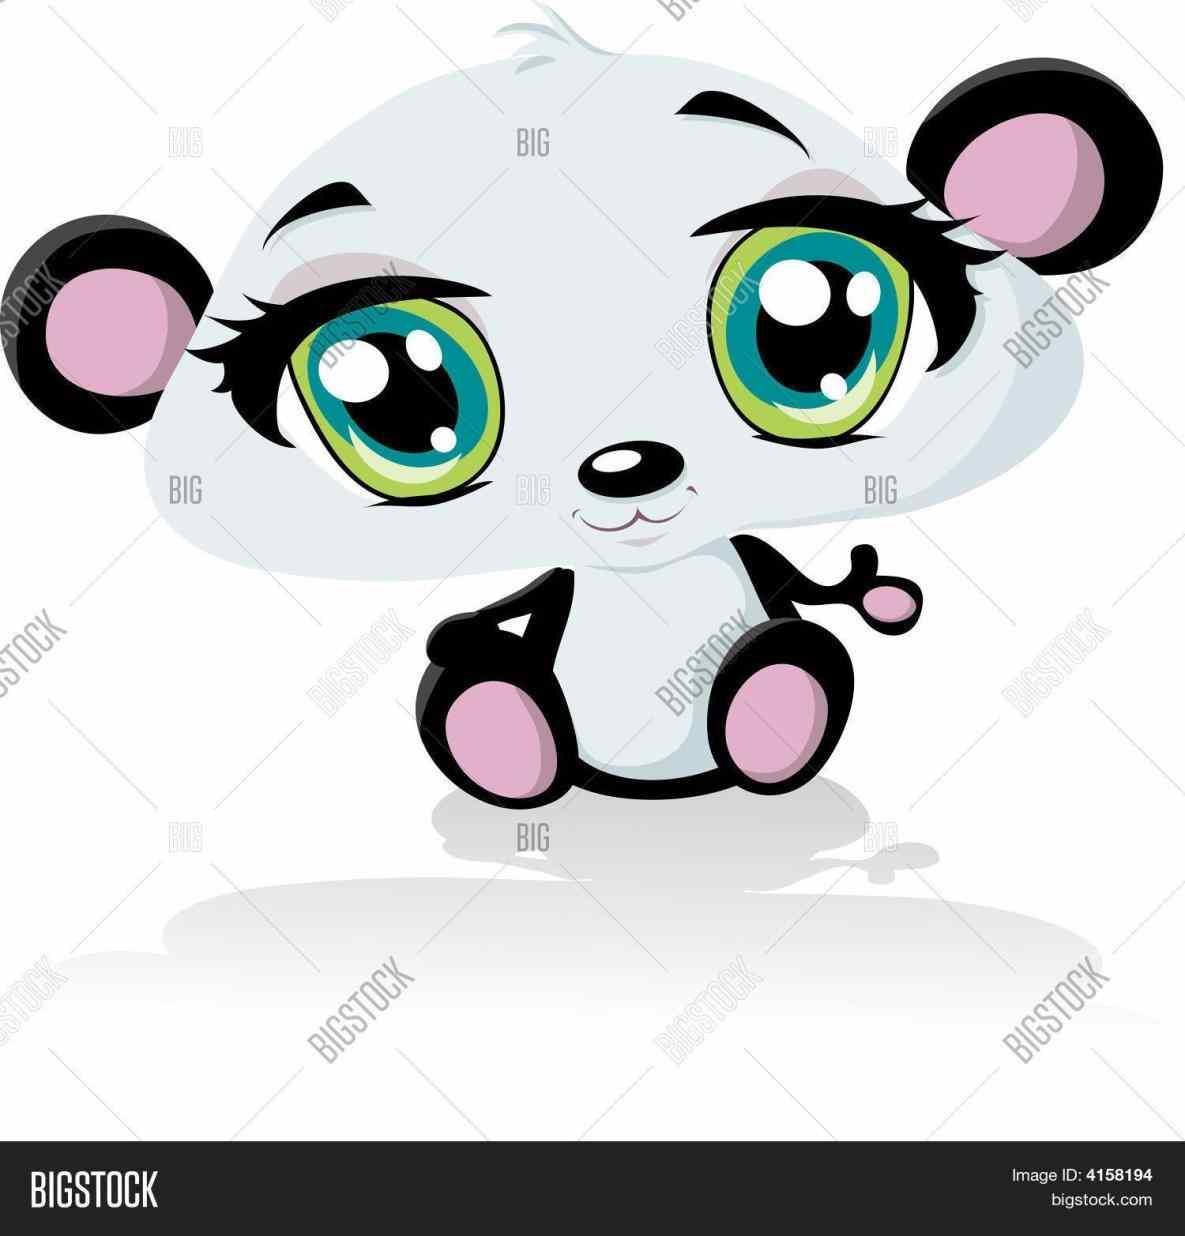 Animated Cute Animated Baby Panda 1185x1236 Wallpaper Teahub Io